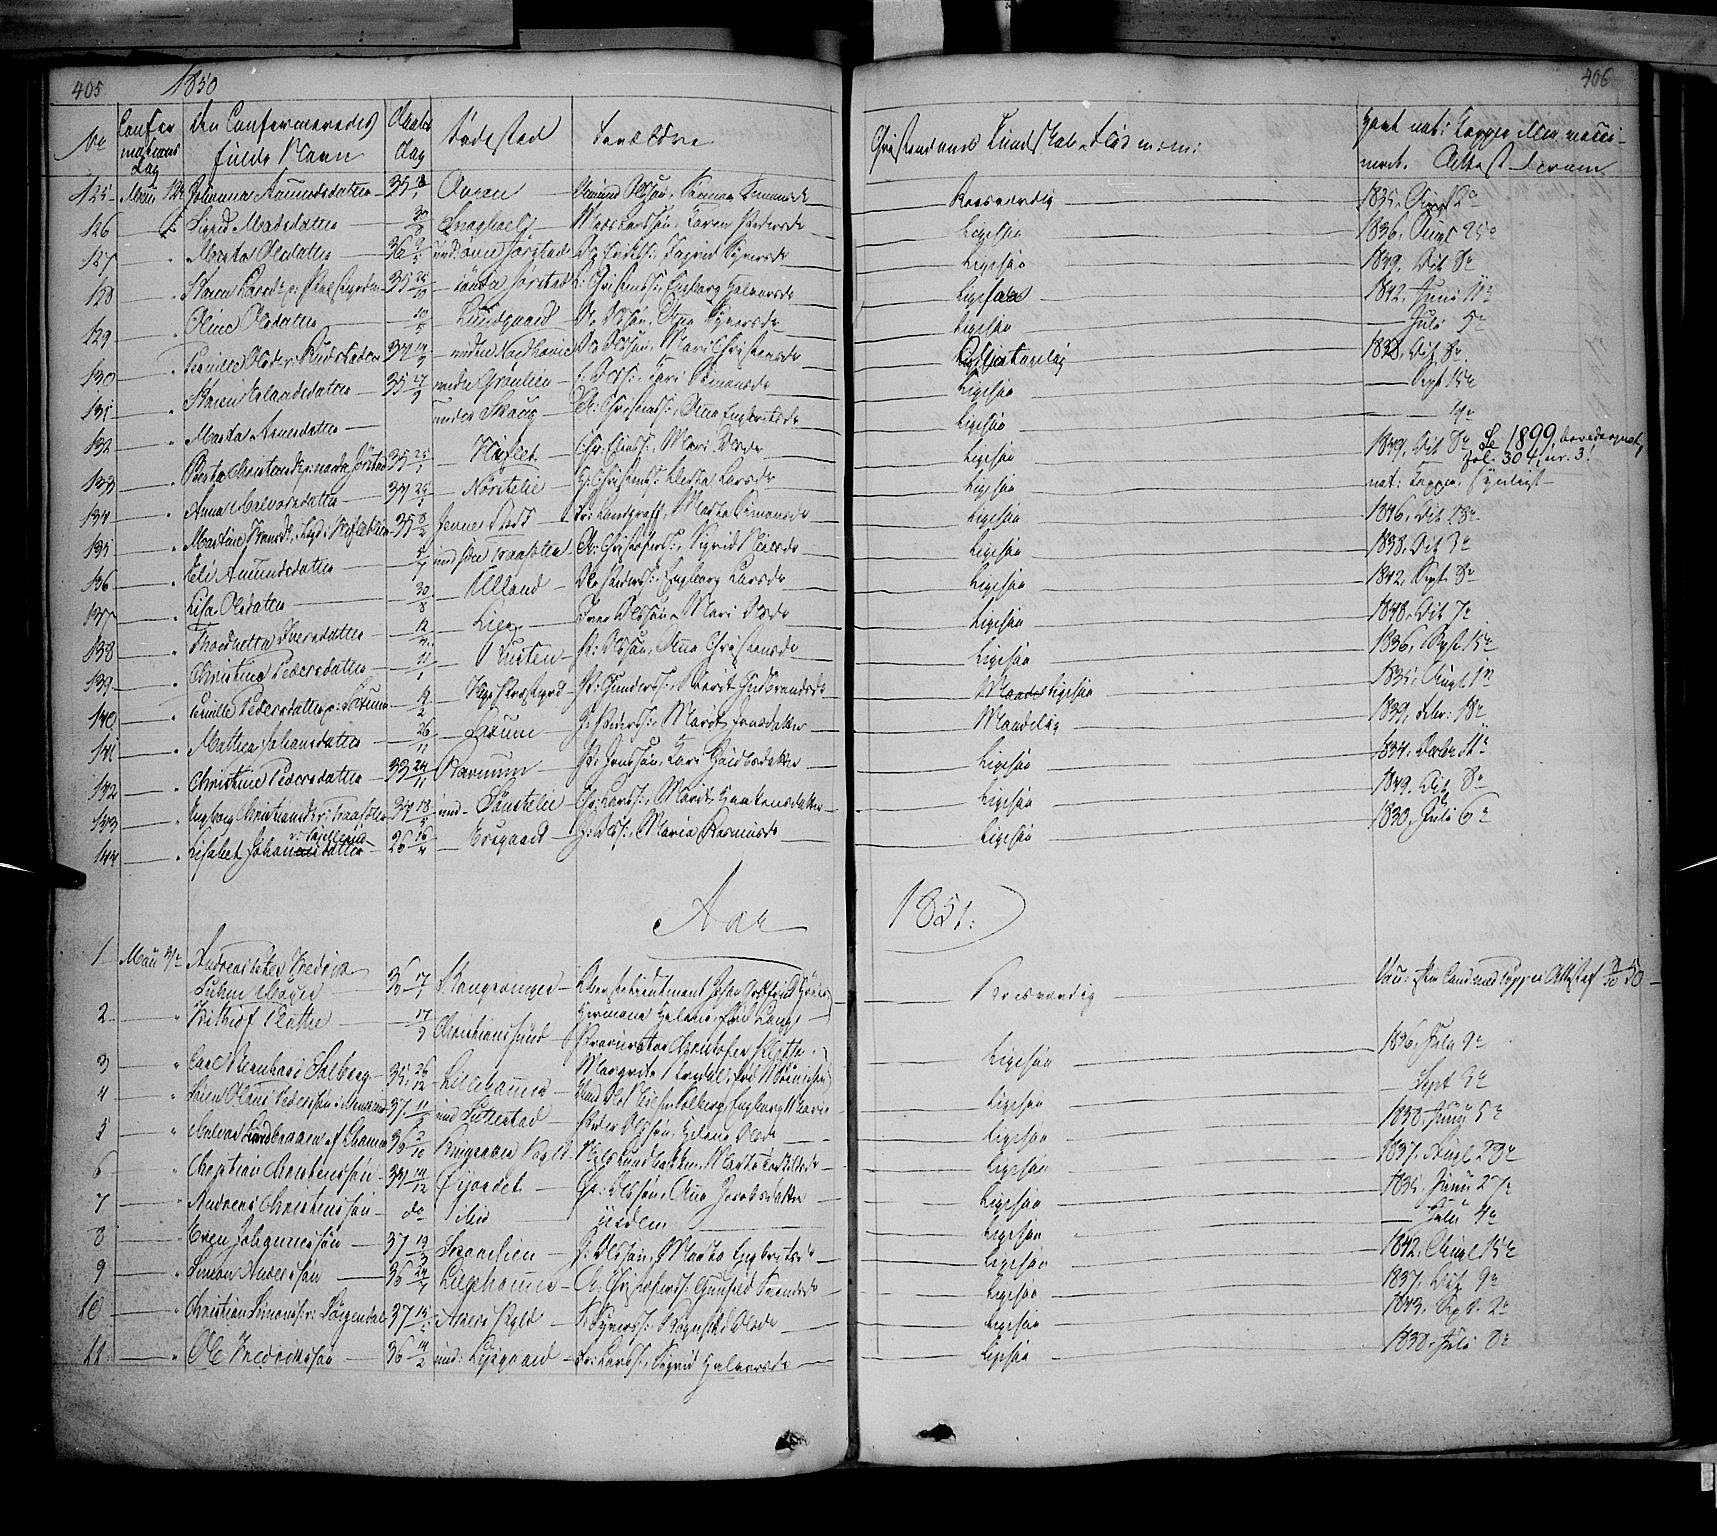 SAH, Fåberg prestekontor, Ministerialbok nr. 5, 1836-1854, s. 405-406